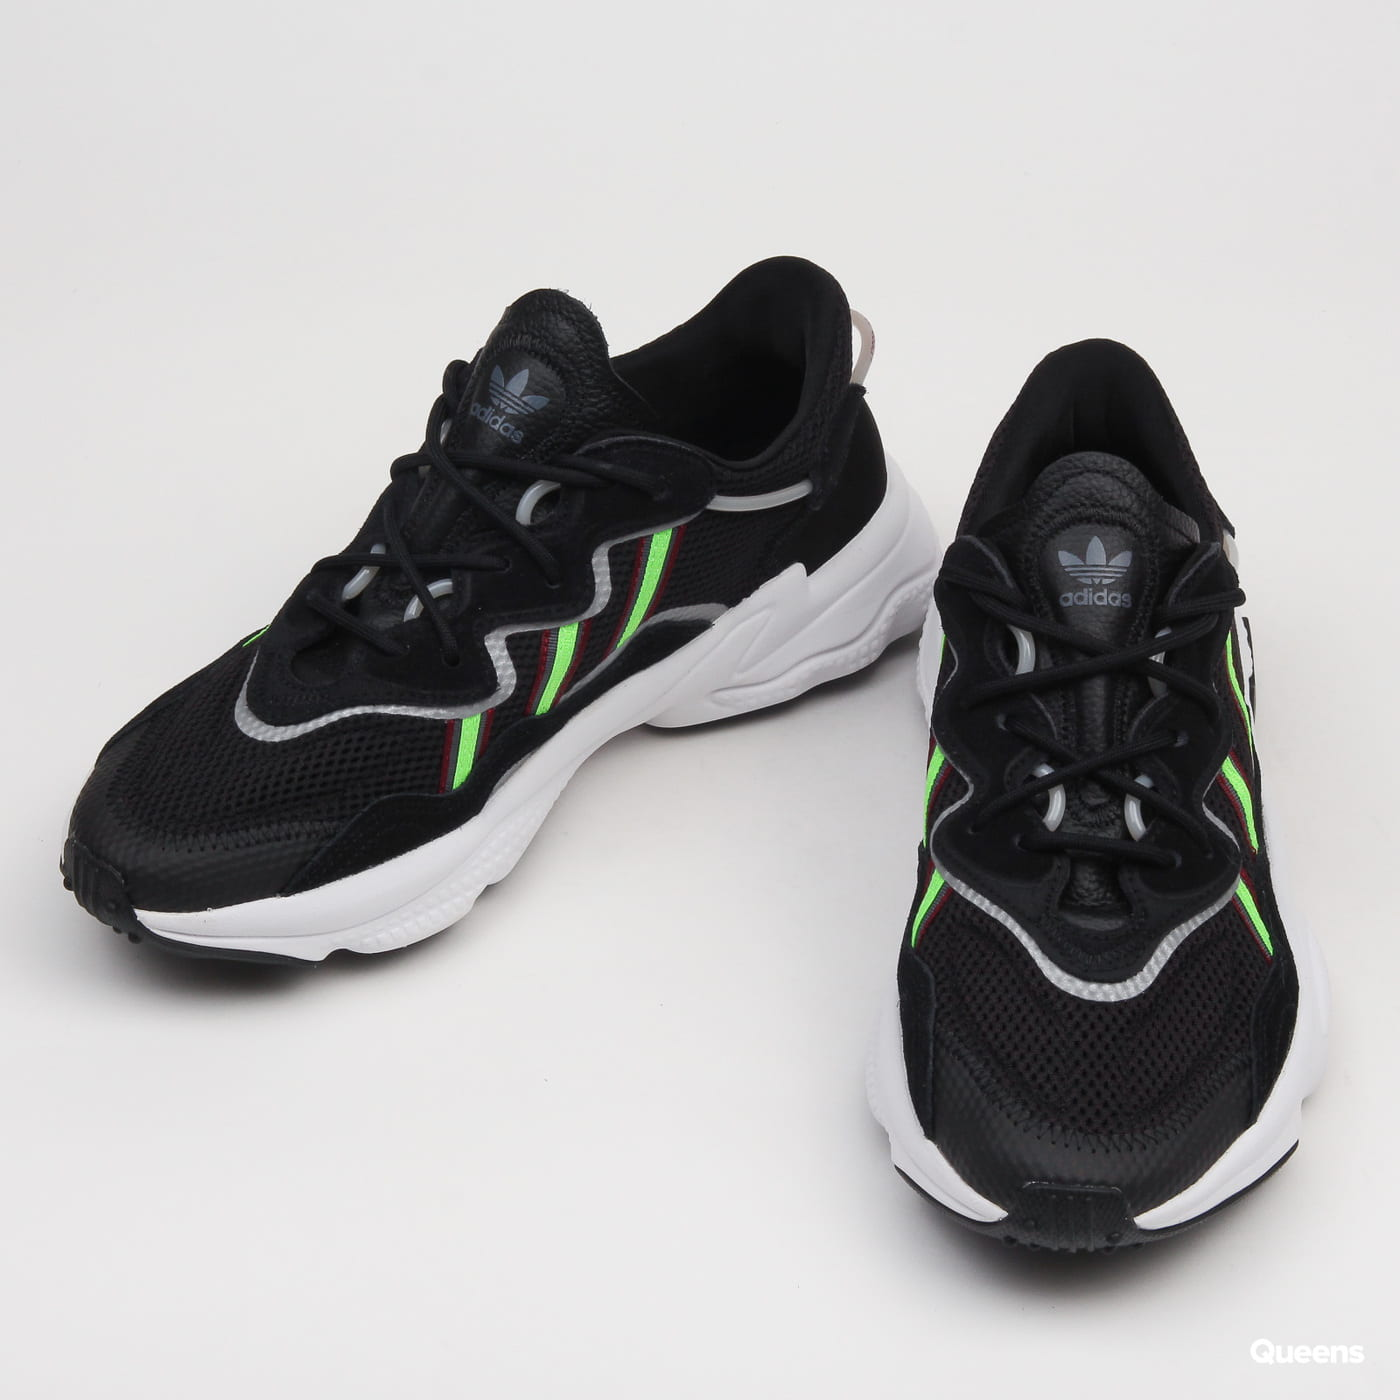 adidas Originals Ozweego cblack / sgreen / onix